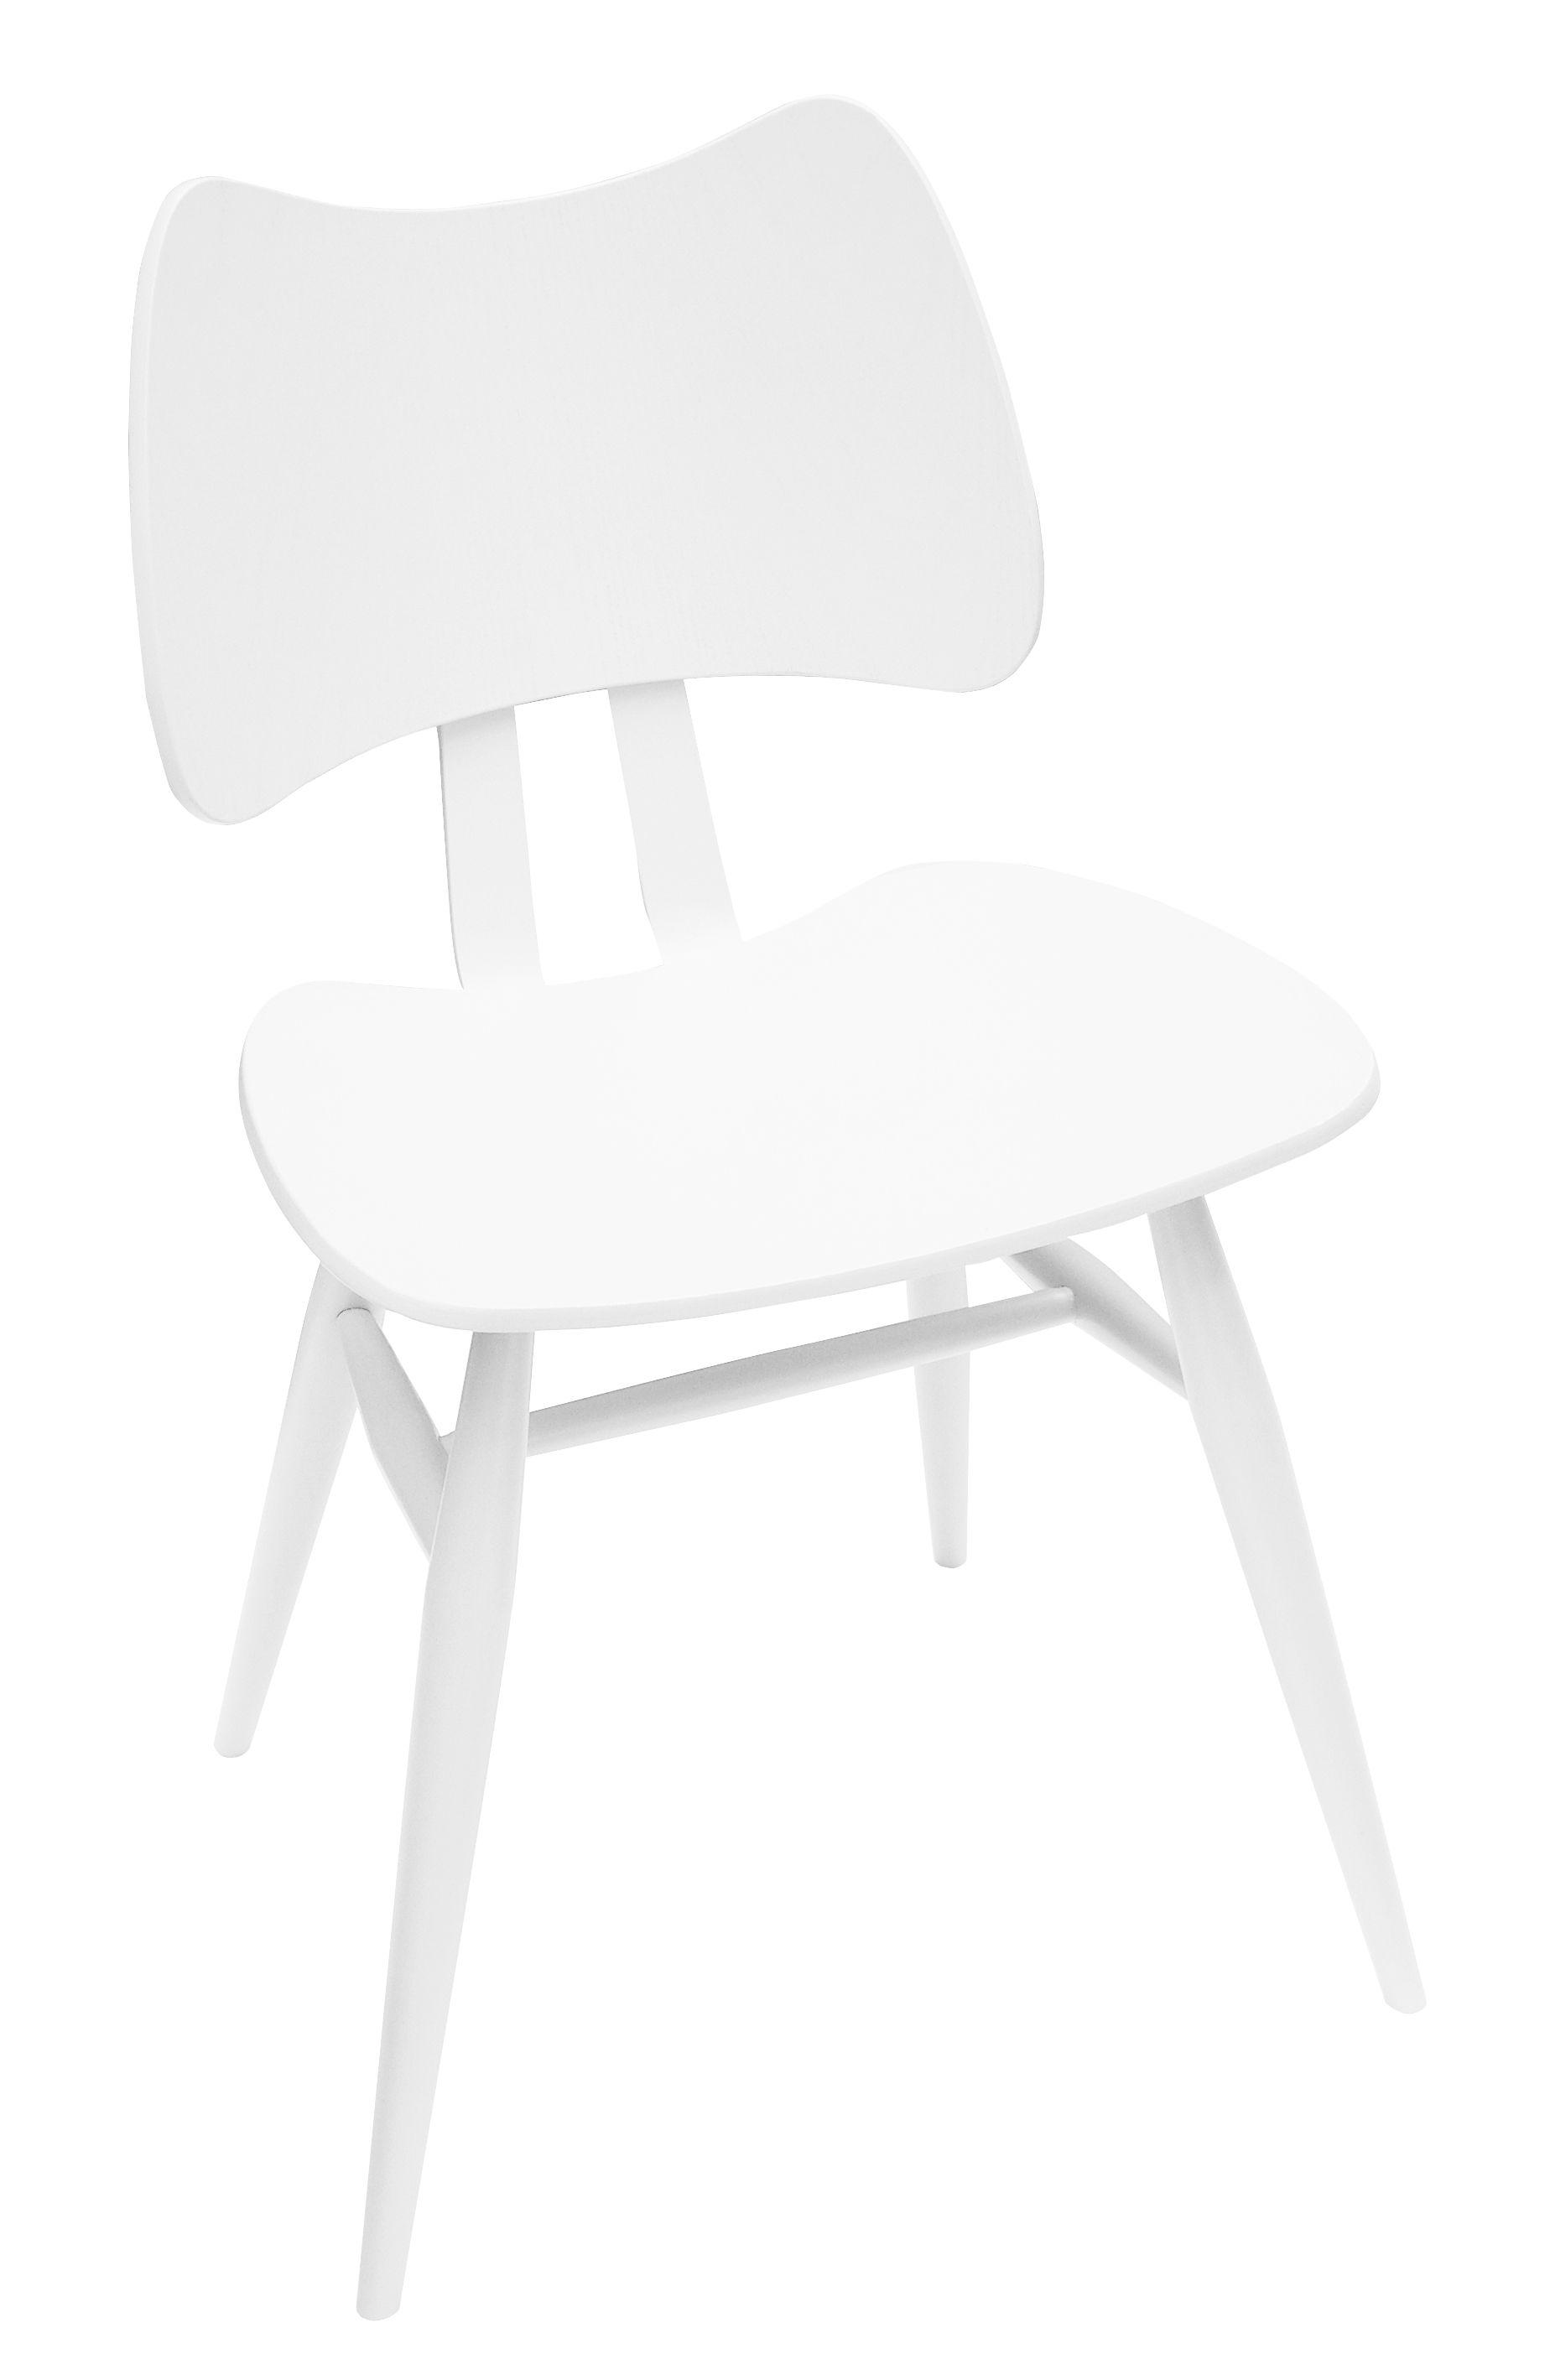 Möbel - Stühle  - Butterfly Stuhl / Holz - Neuauflage des Originals aus dem Jahr 1958 - Ercol - Weiß - Contreplaqué de orme, massive Buche